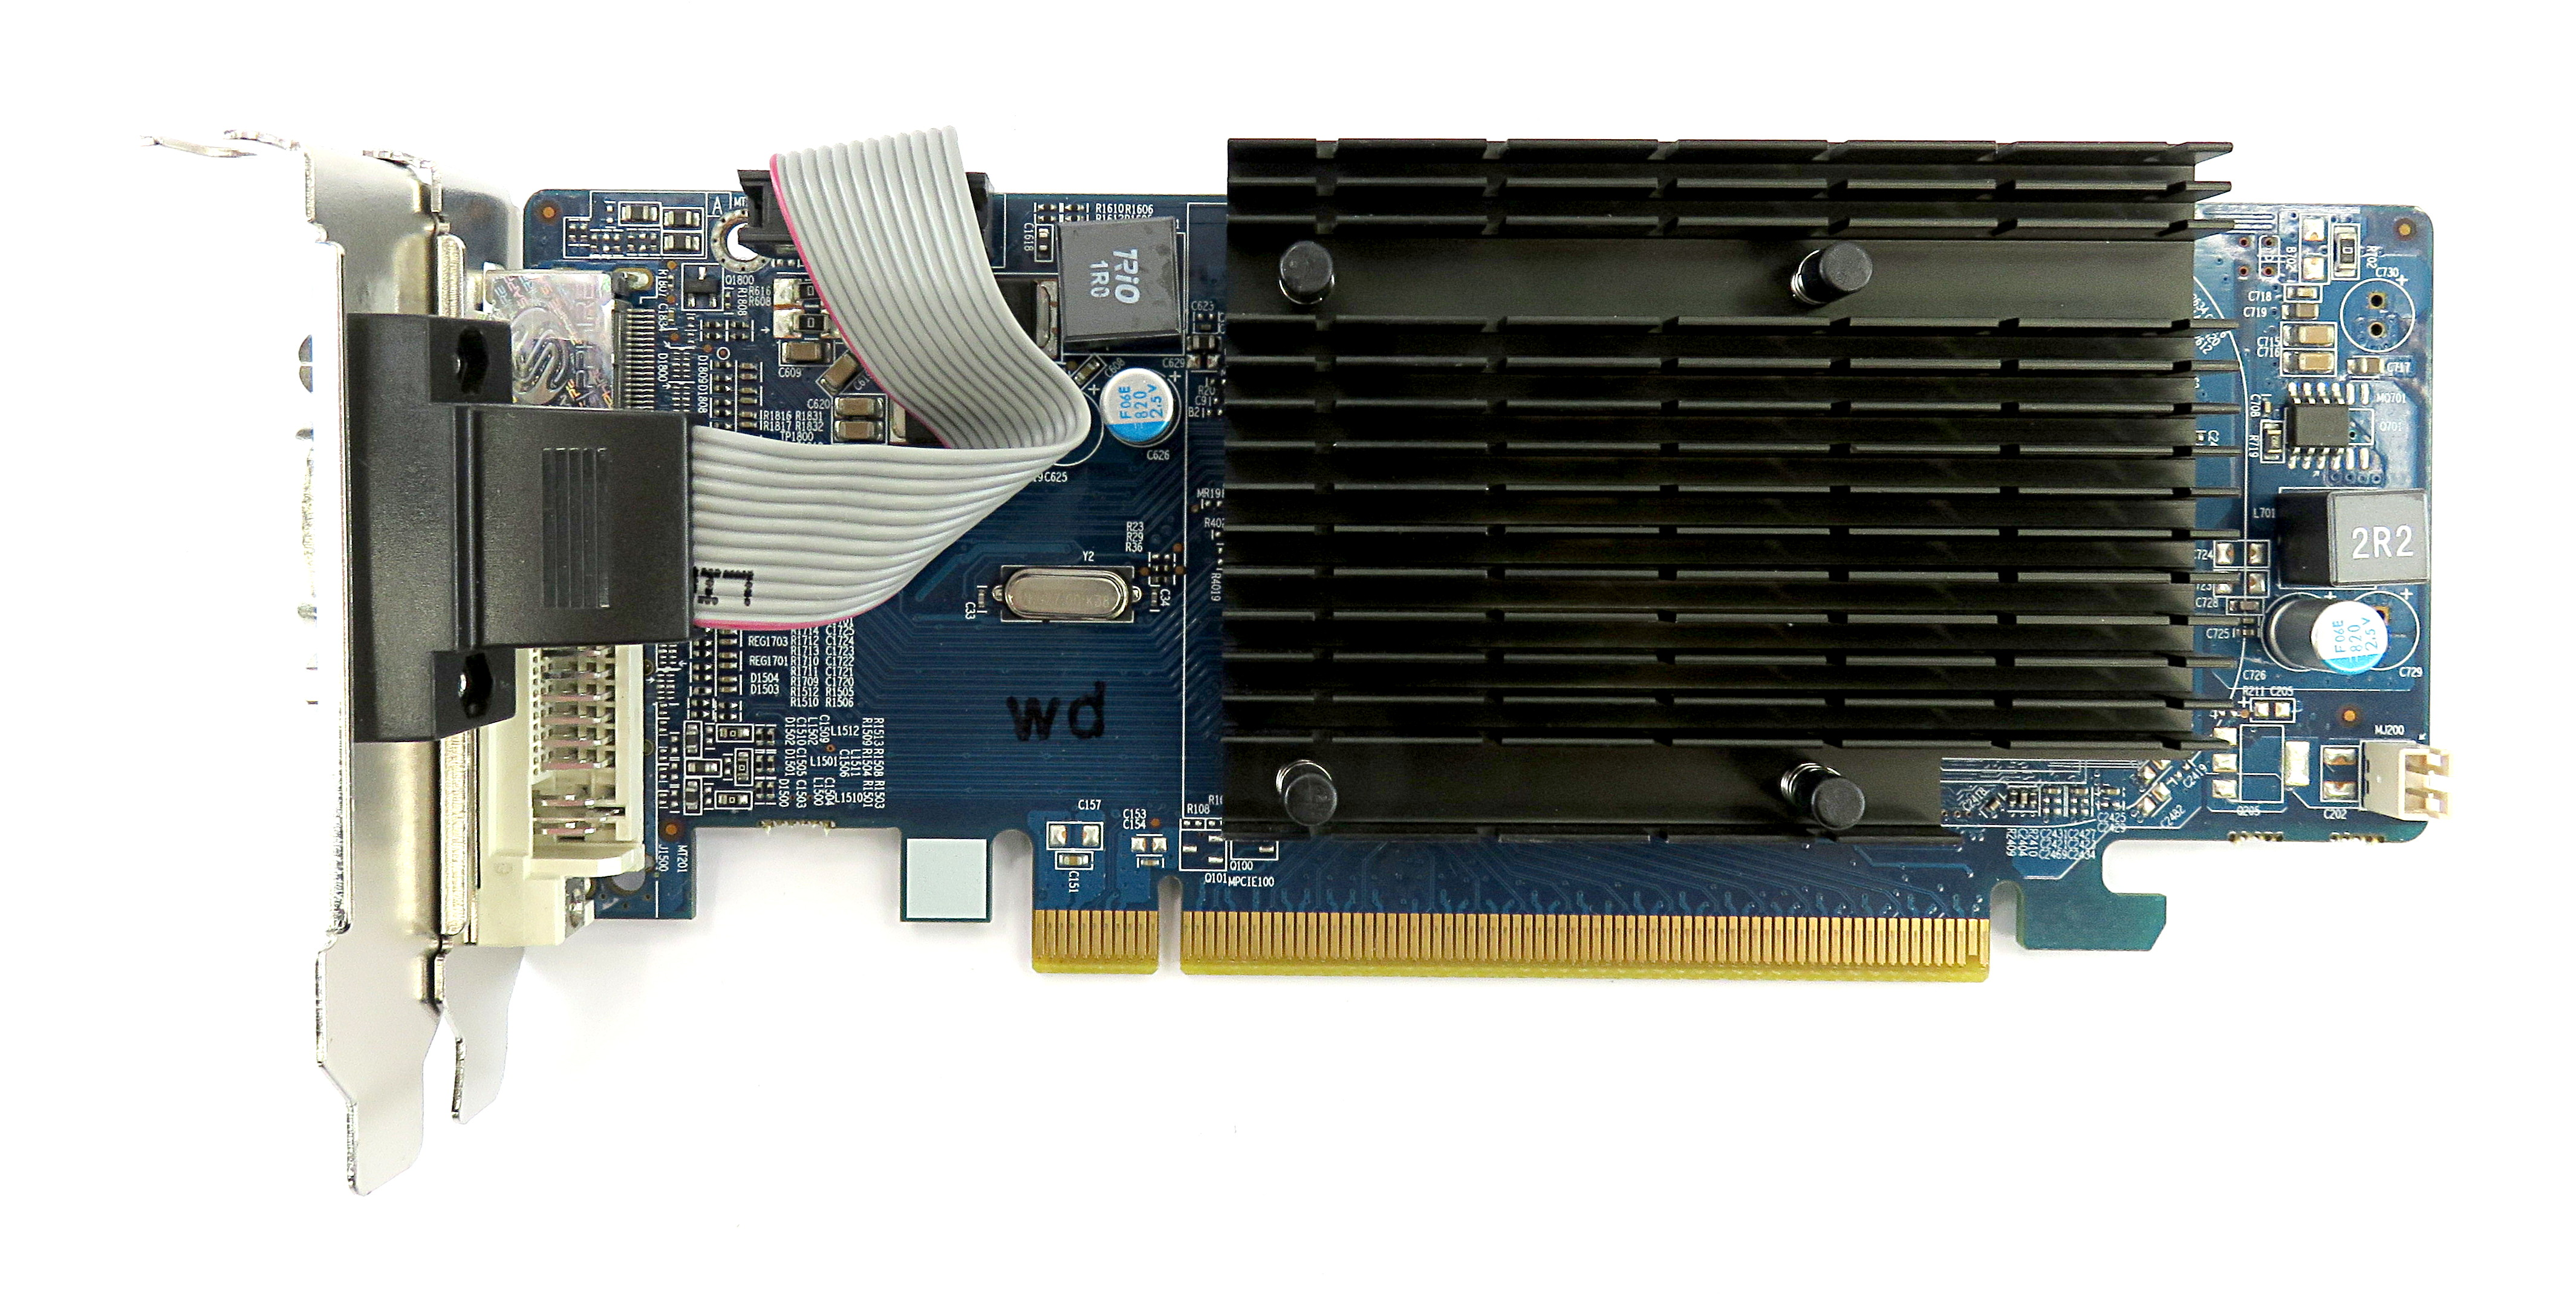 299-1E172-300SA Sapphire HD4350 512MB H/D/V Low-Profile Silent Graphics Card